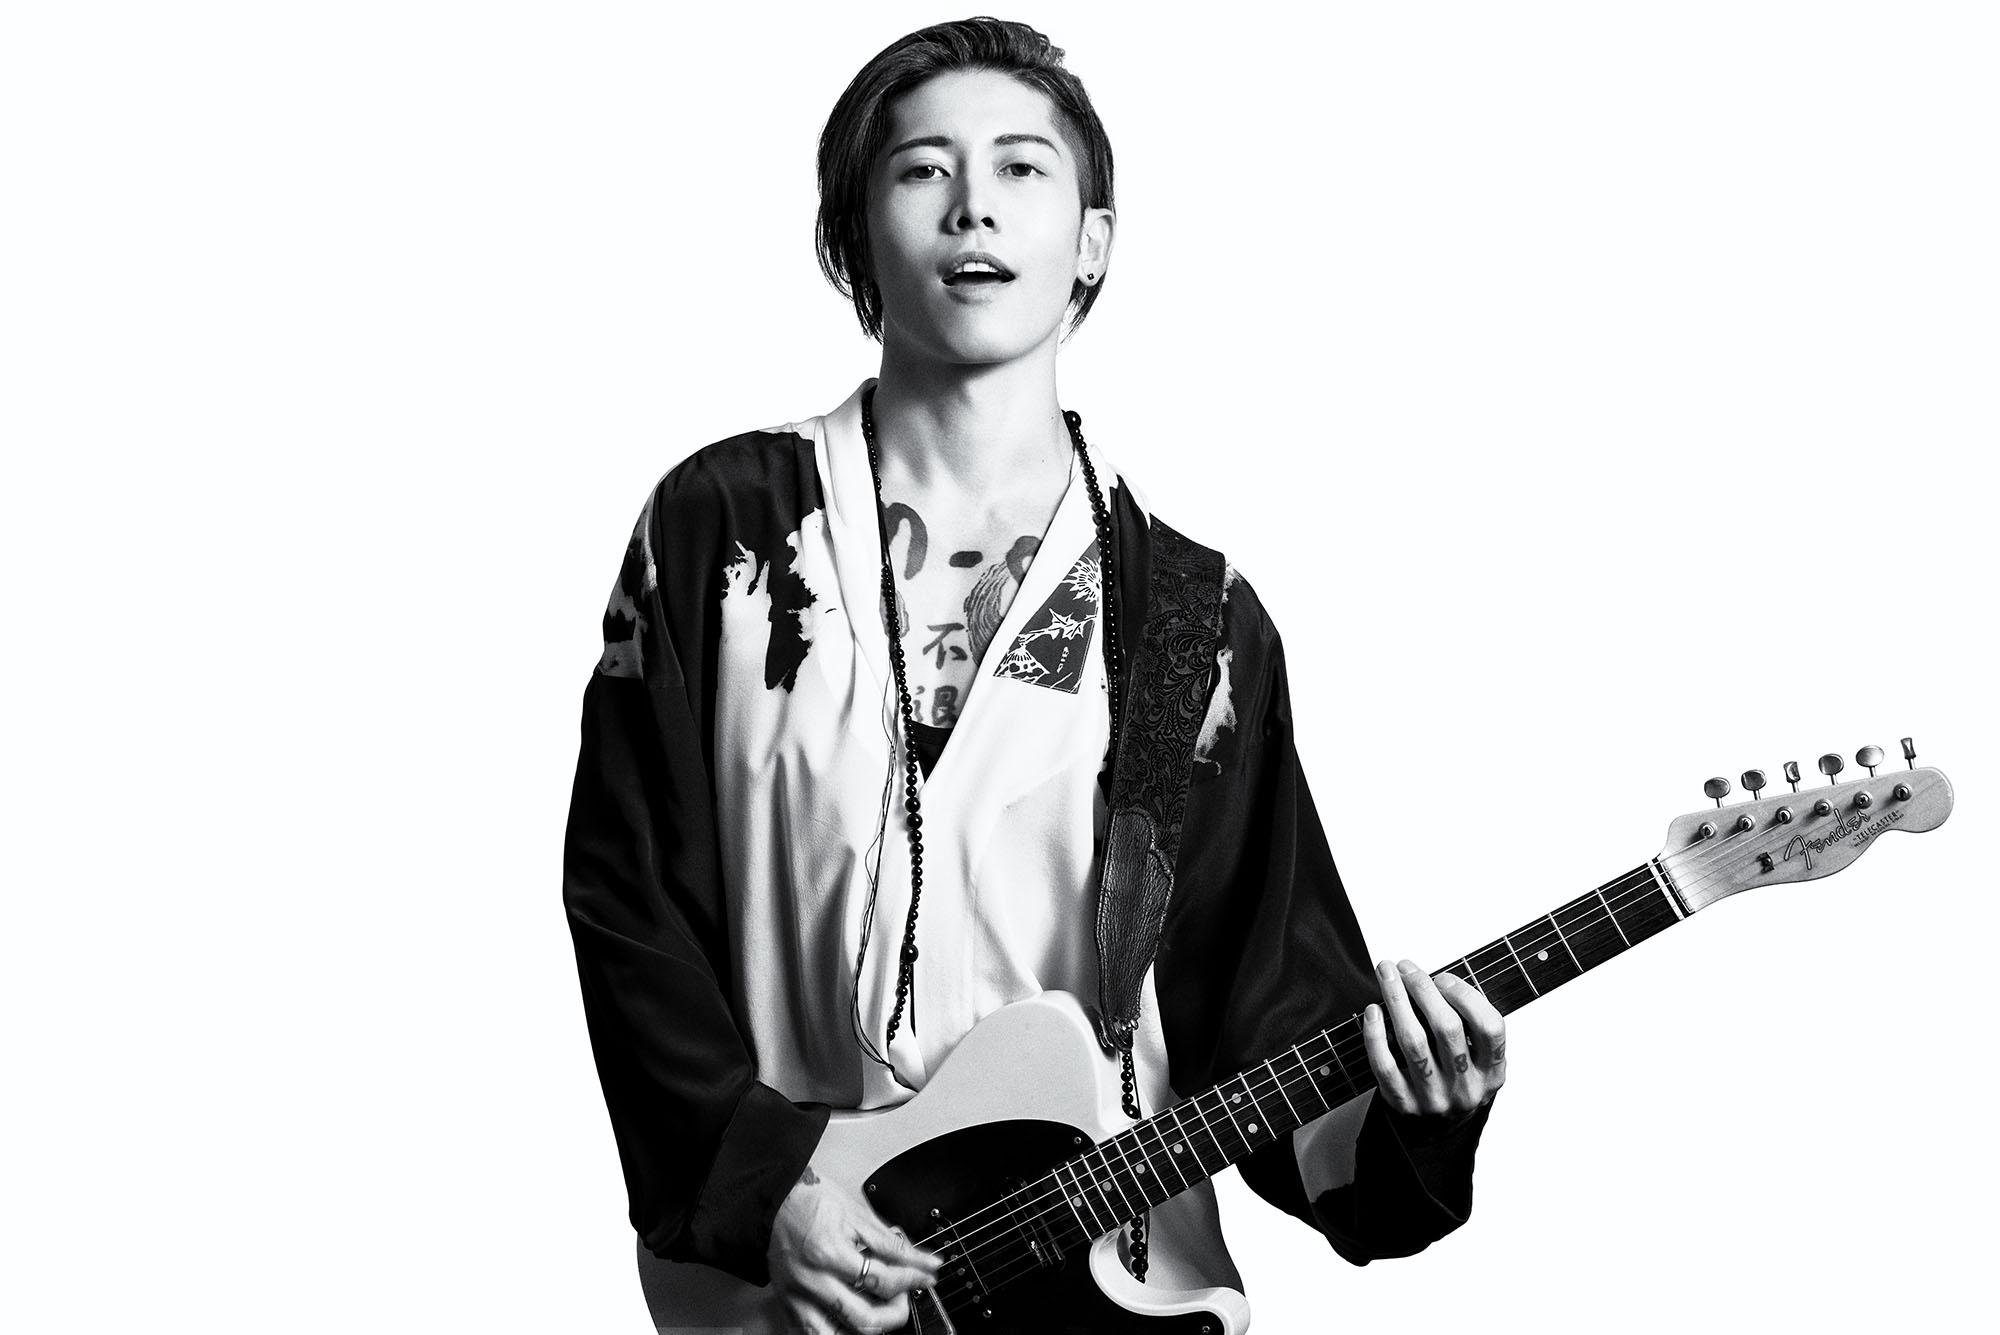 Photographer UTSUMI、Stylist Masaki Kataoka at Avgvst/(着用衣装) シャツ ¥ 168,000、タンクトップ ¥ 36,000、トラウザーズ ¥ 111,000、ネックレス ¥ 27,000 以上全て Haider Ackermann/三喜商事 03-3238-1398